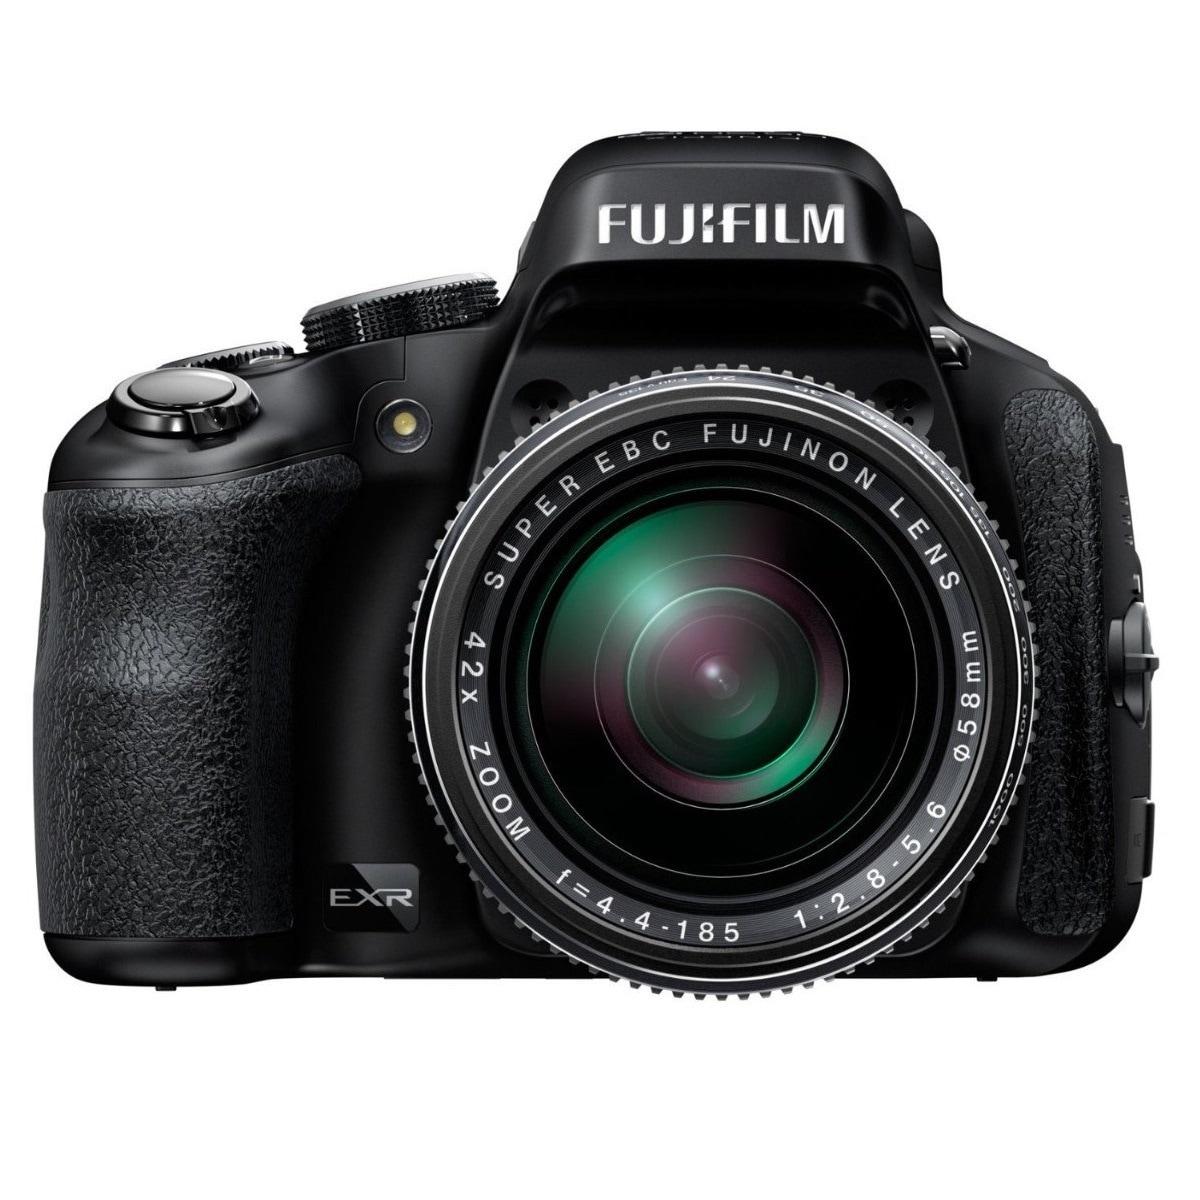 Fuji HS50EXR 16MP Black Digital Camera (New Non Retail Pa...